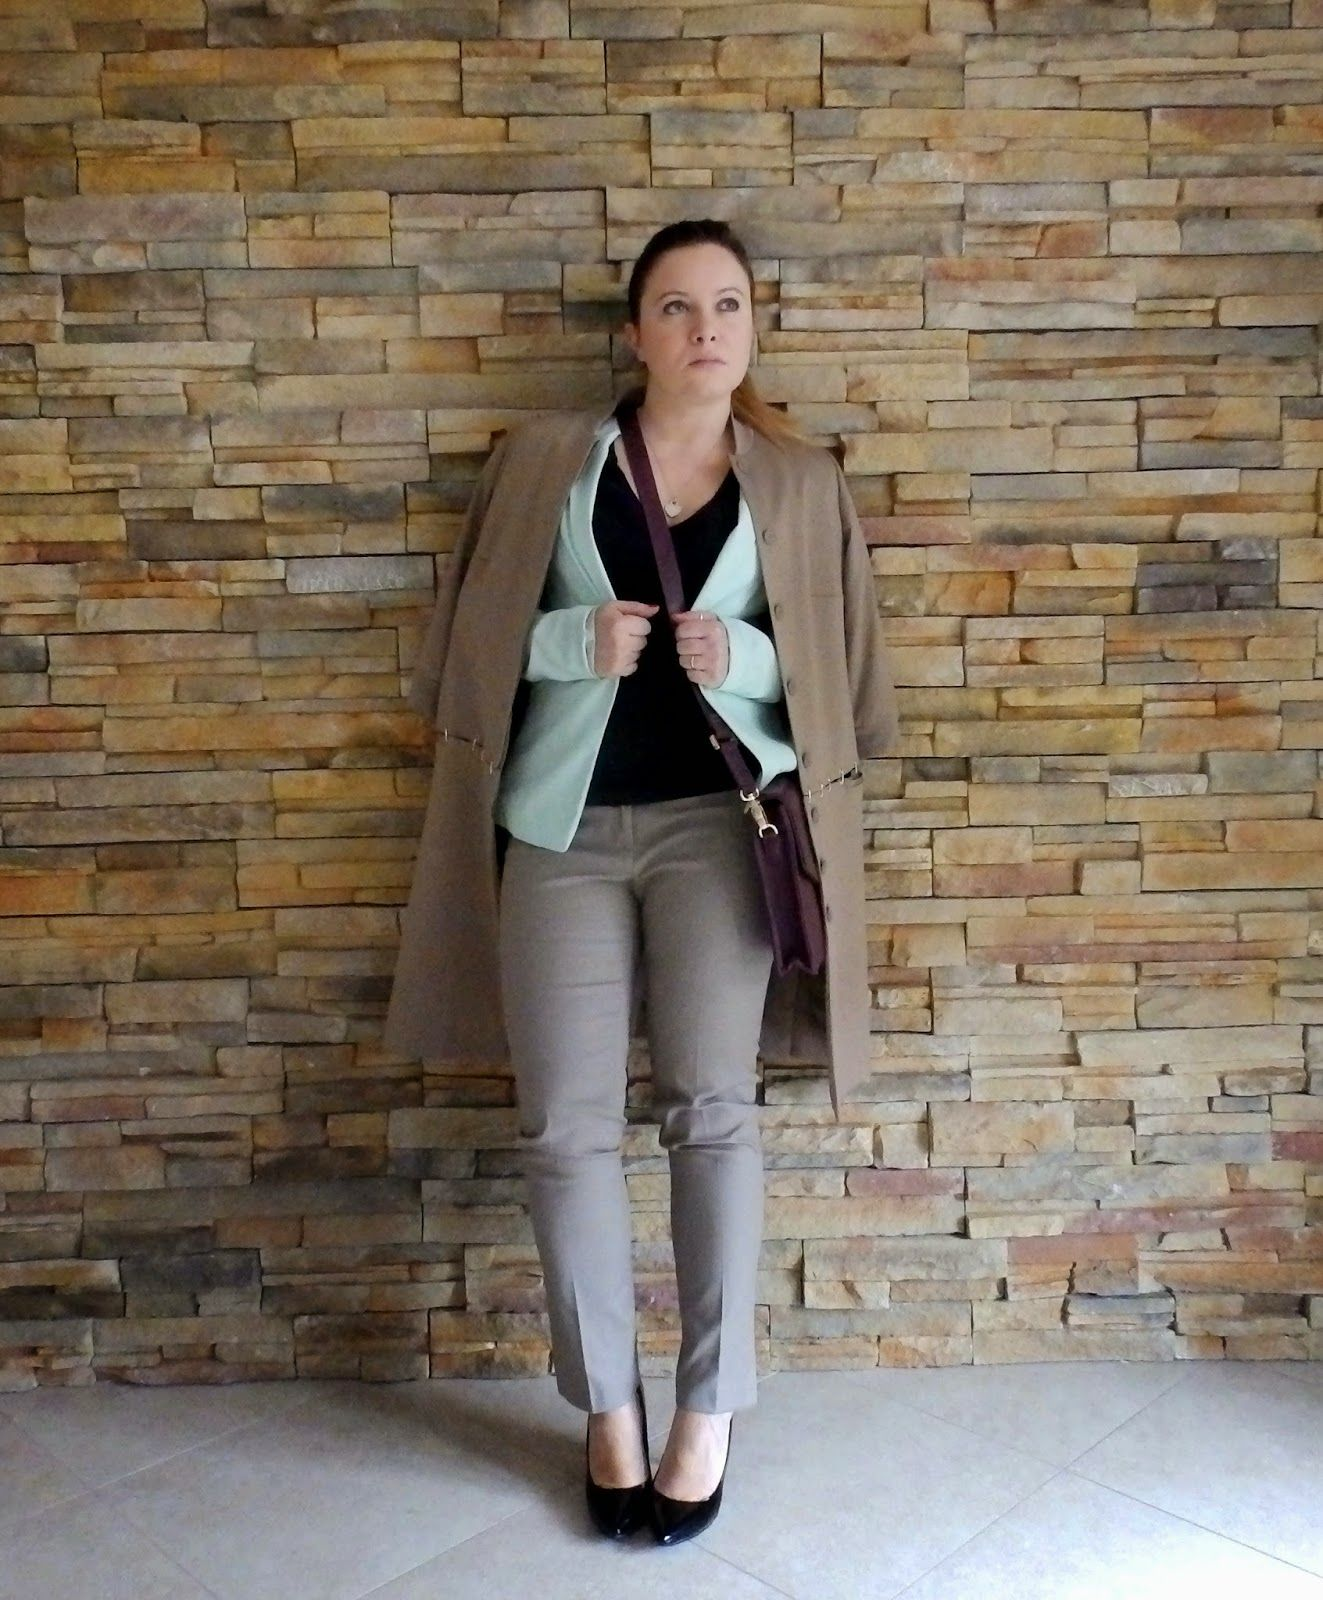 Fashion Blog - Carola Disiot - Purses in the Kitchen : Where is Cinderella ?